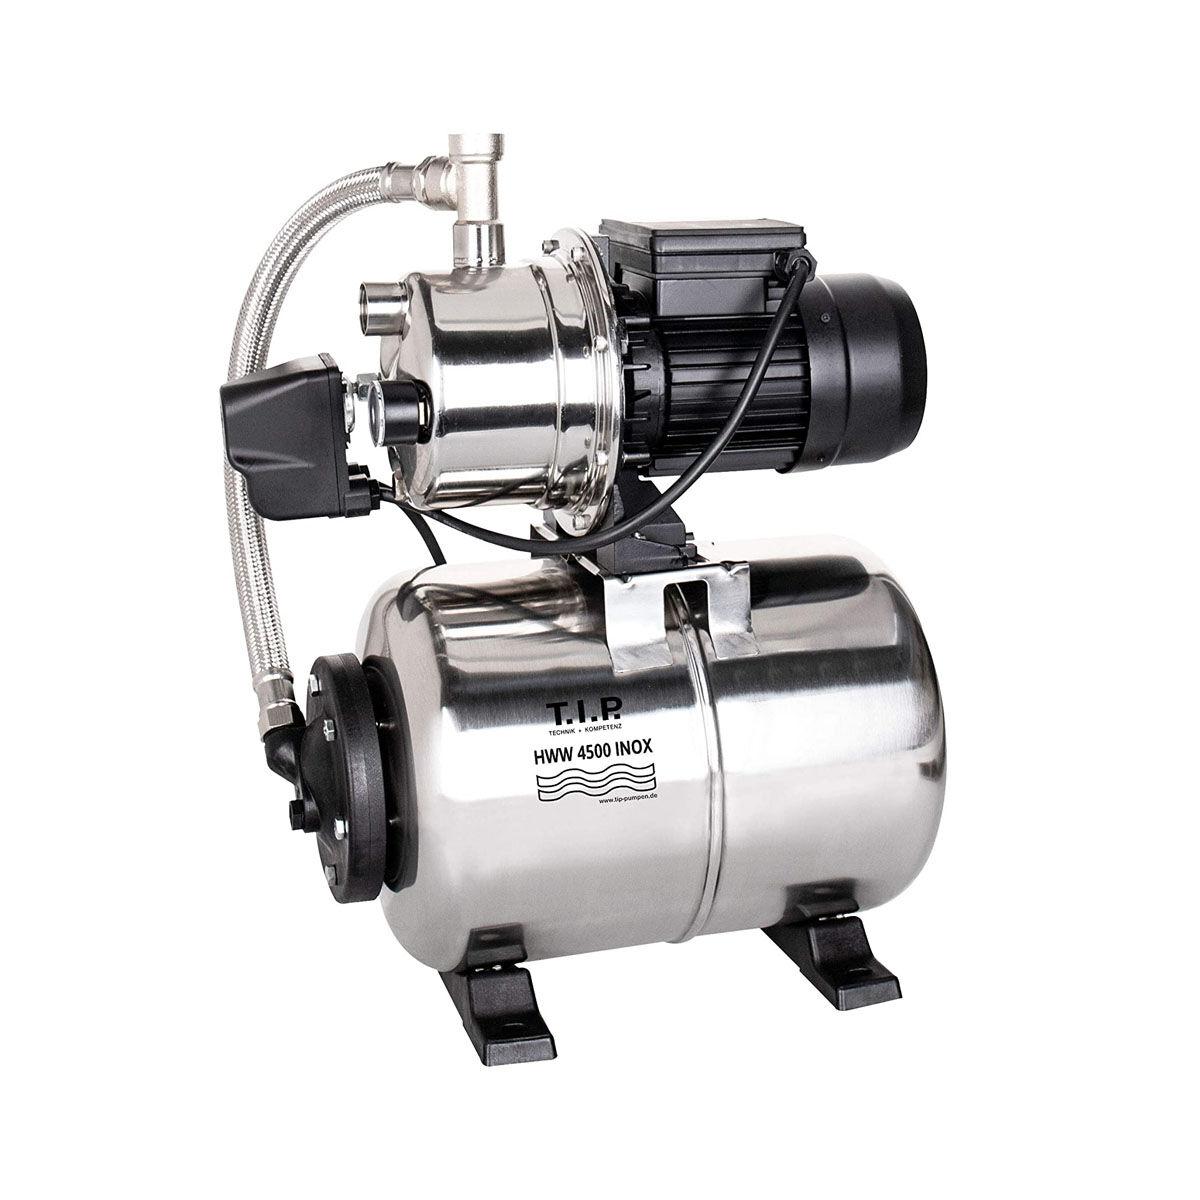 T.I.P. HWW 4500 INOX Pompe surpresseur